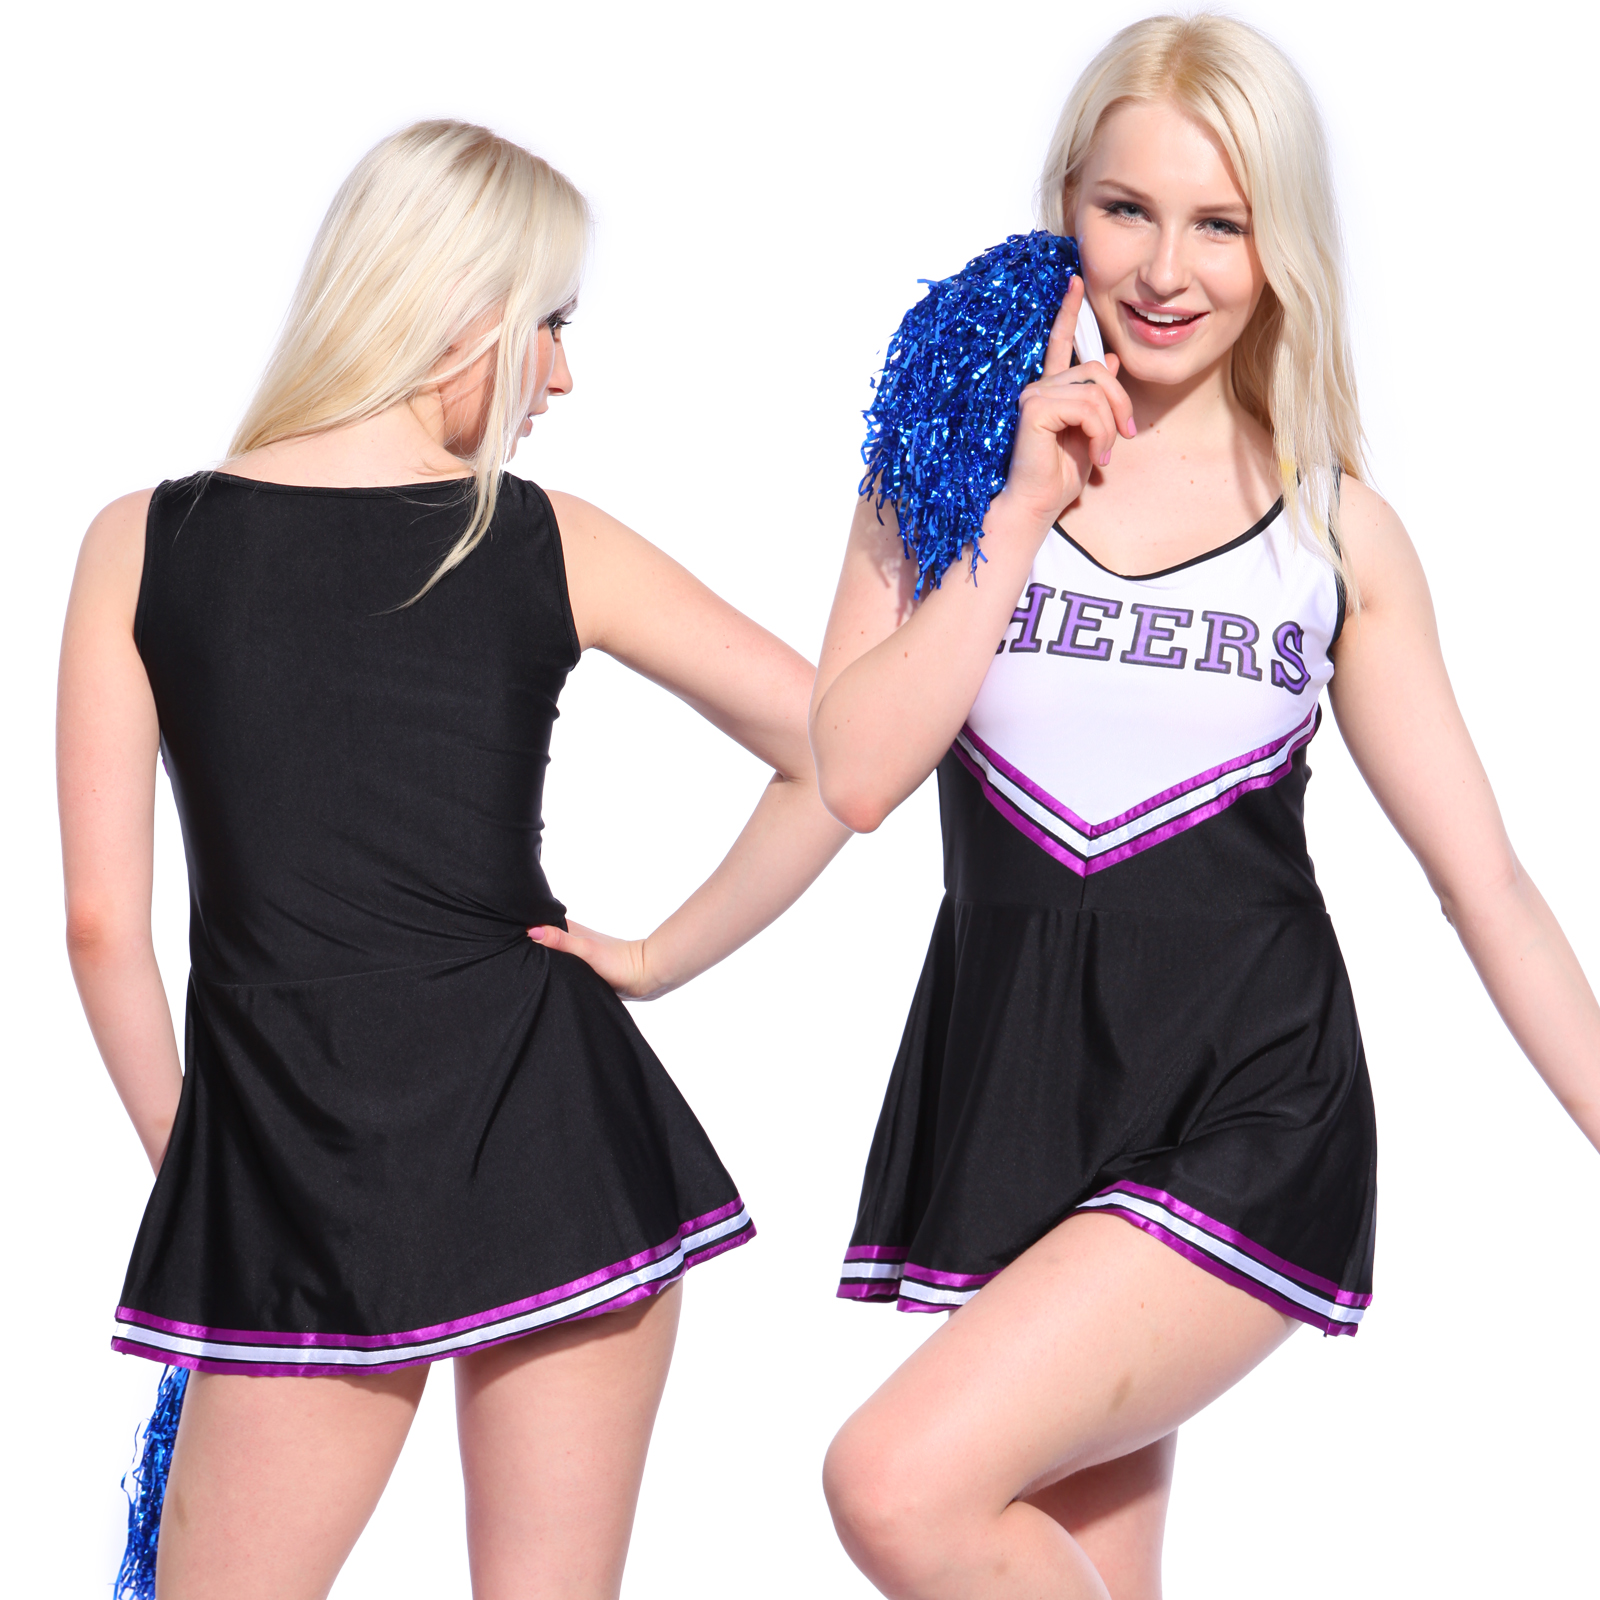 Sexy high school cheerleading uniforms